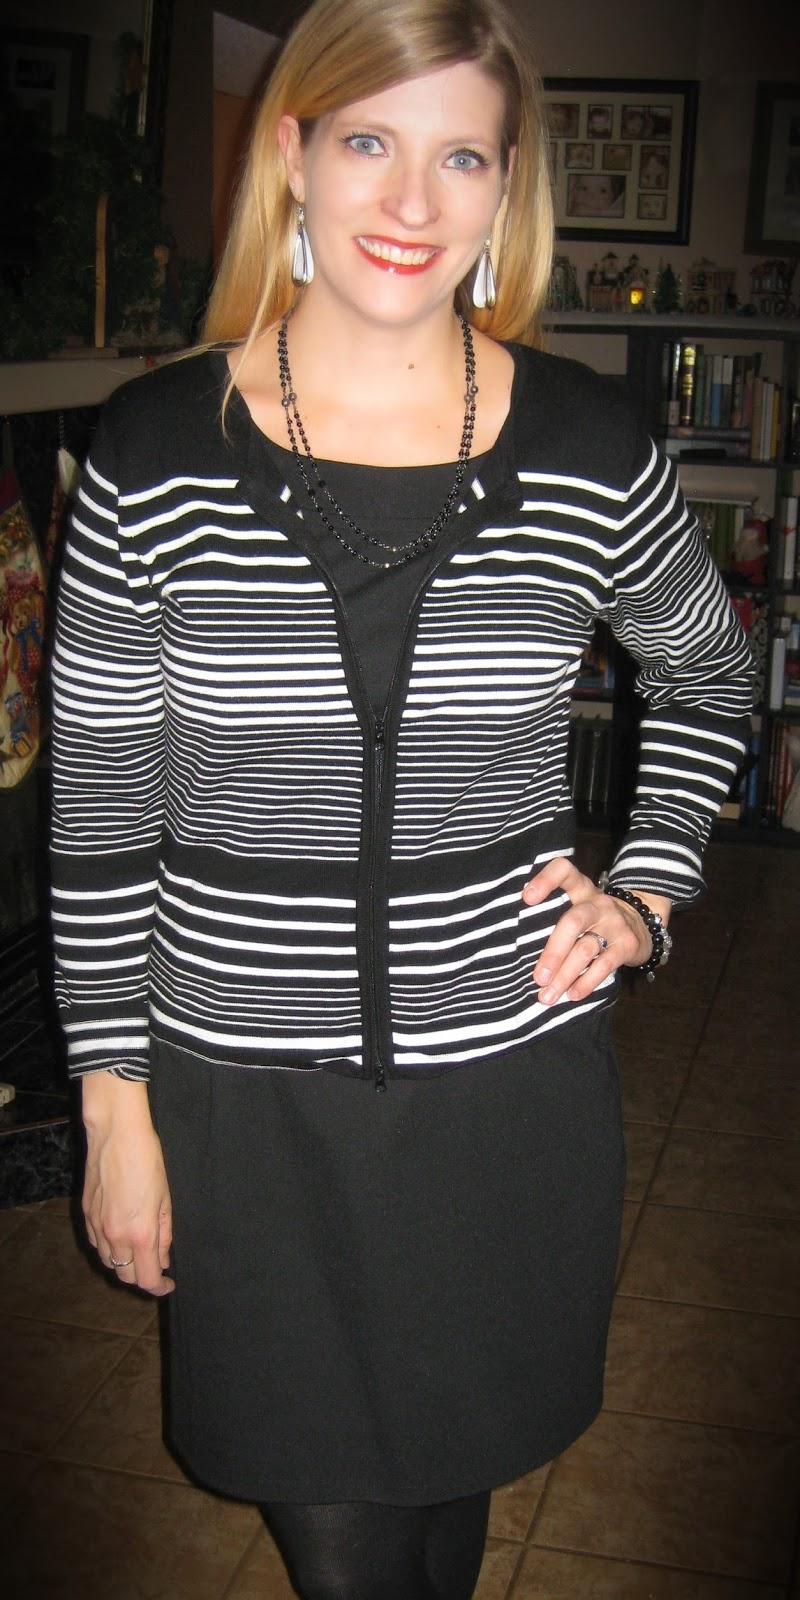 http://vvboutiquestyle.blogspot.ca/2013/12/30-degrees-dressember.html